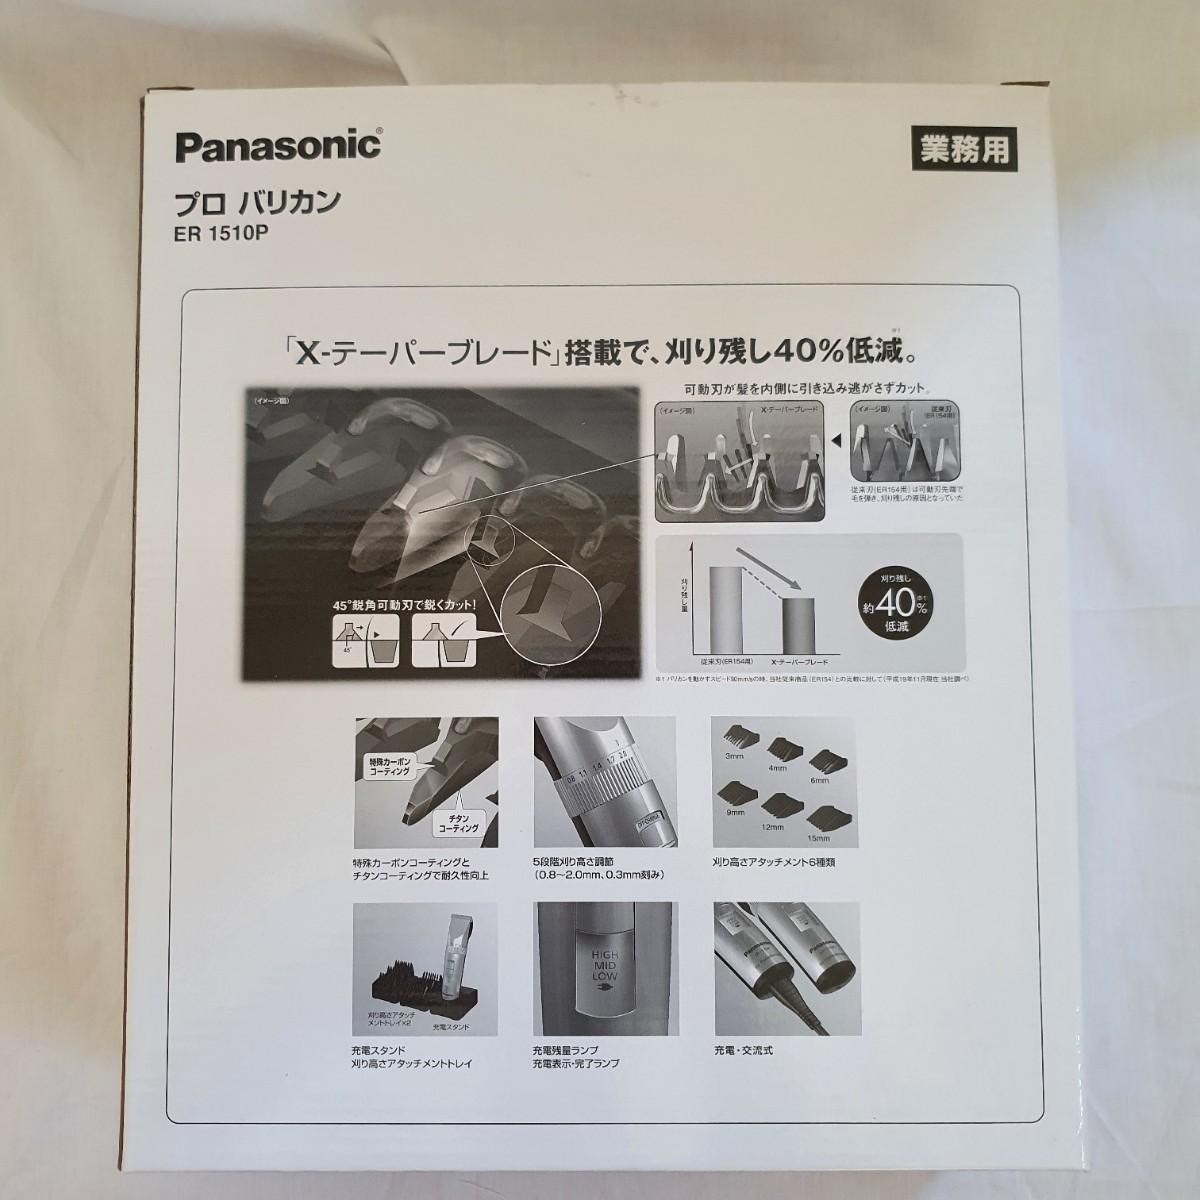 Panasonic パナソニック プロ バリカン 業務用